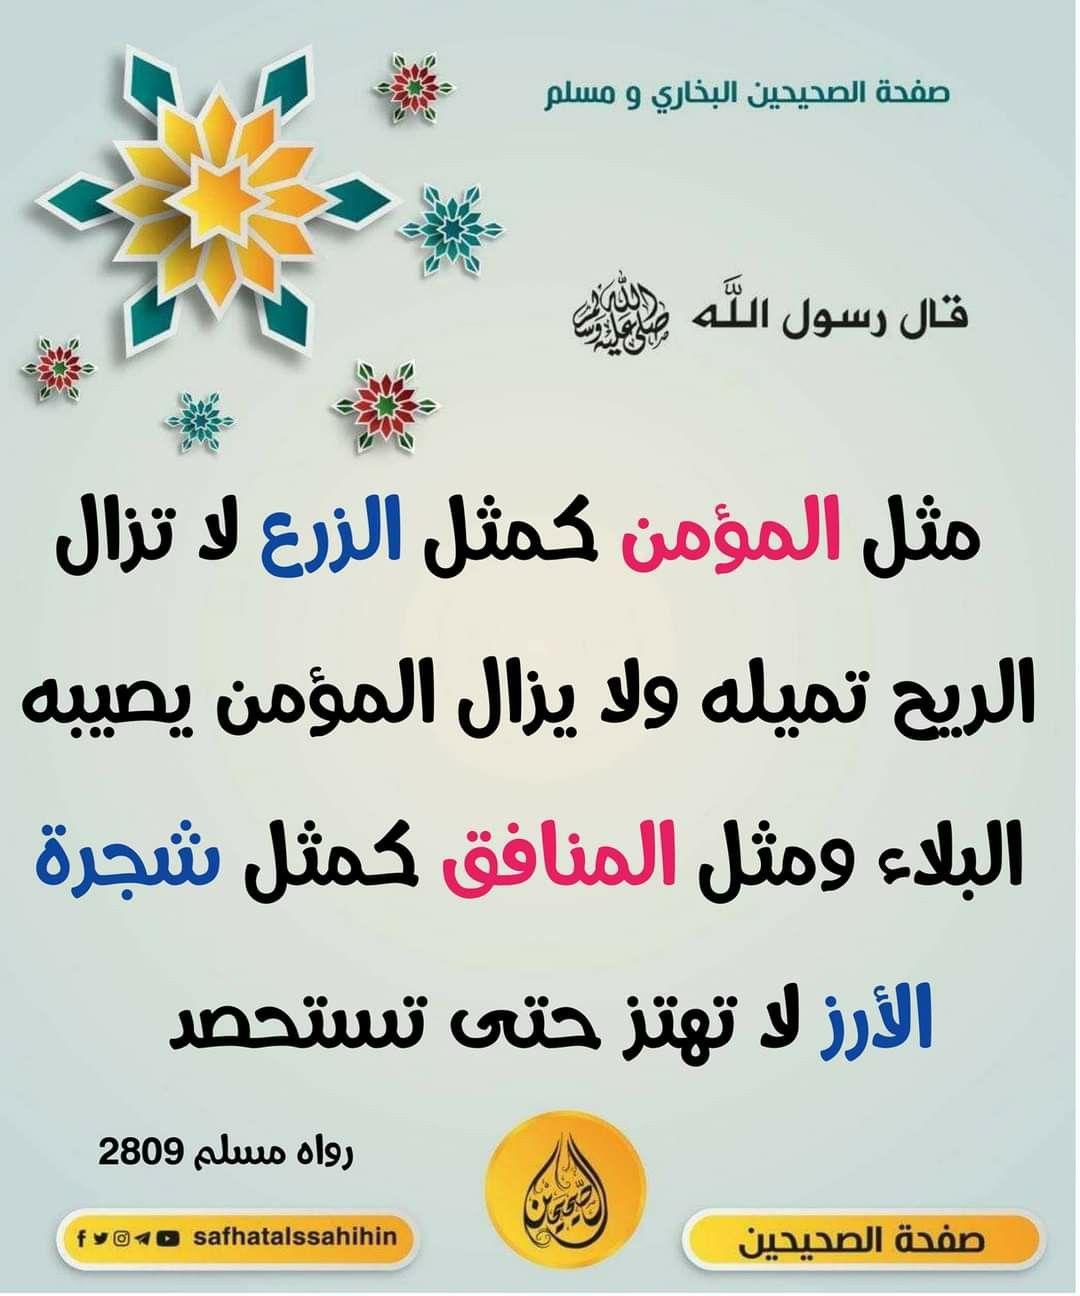 Pin By Maged Egy On الأحاديث النبوية الشريفة Arabic Love Quotes Hadeeth Hadith